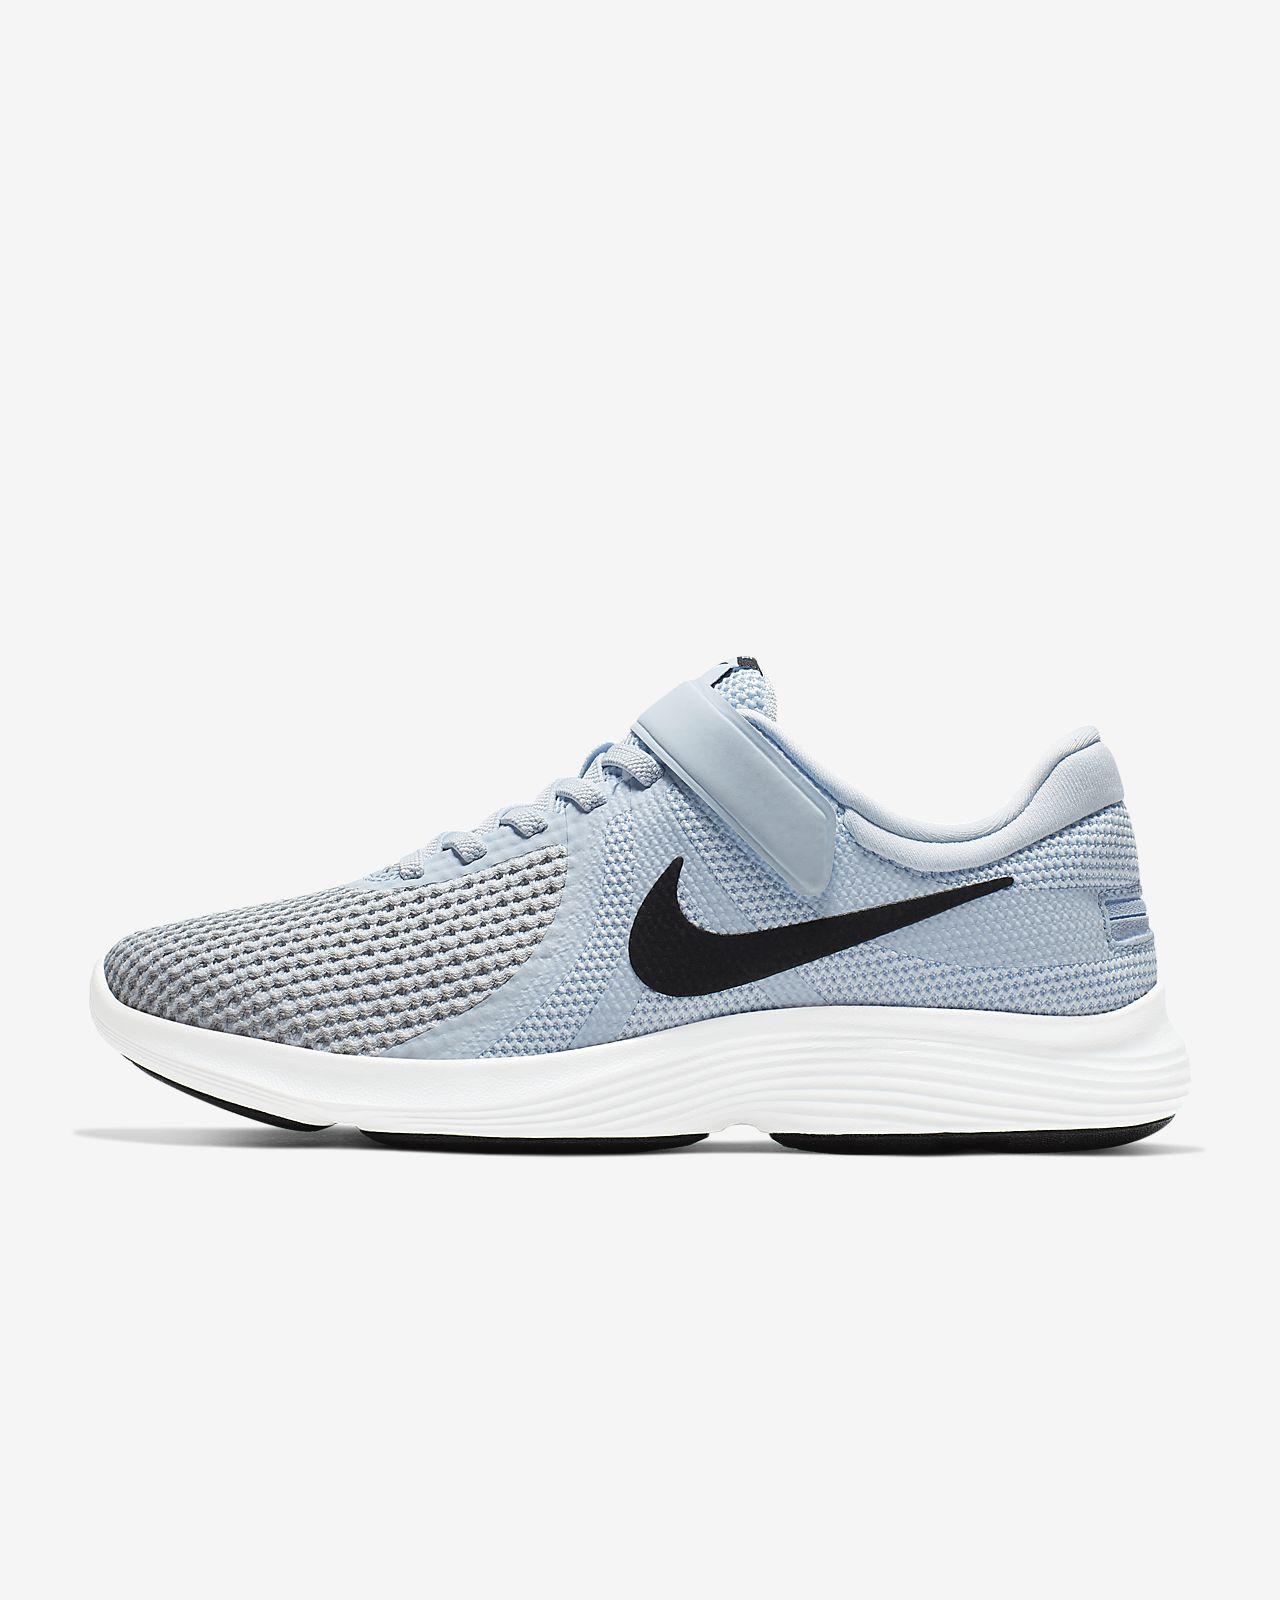 Dámská běžecká bota Nike Revolution 4 FlyEase